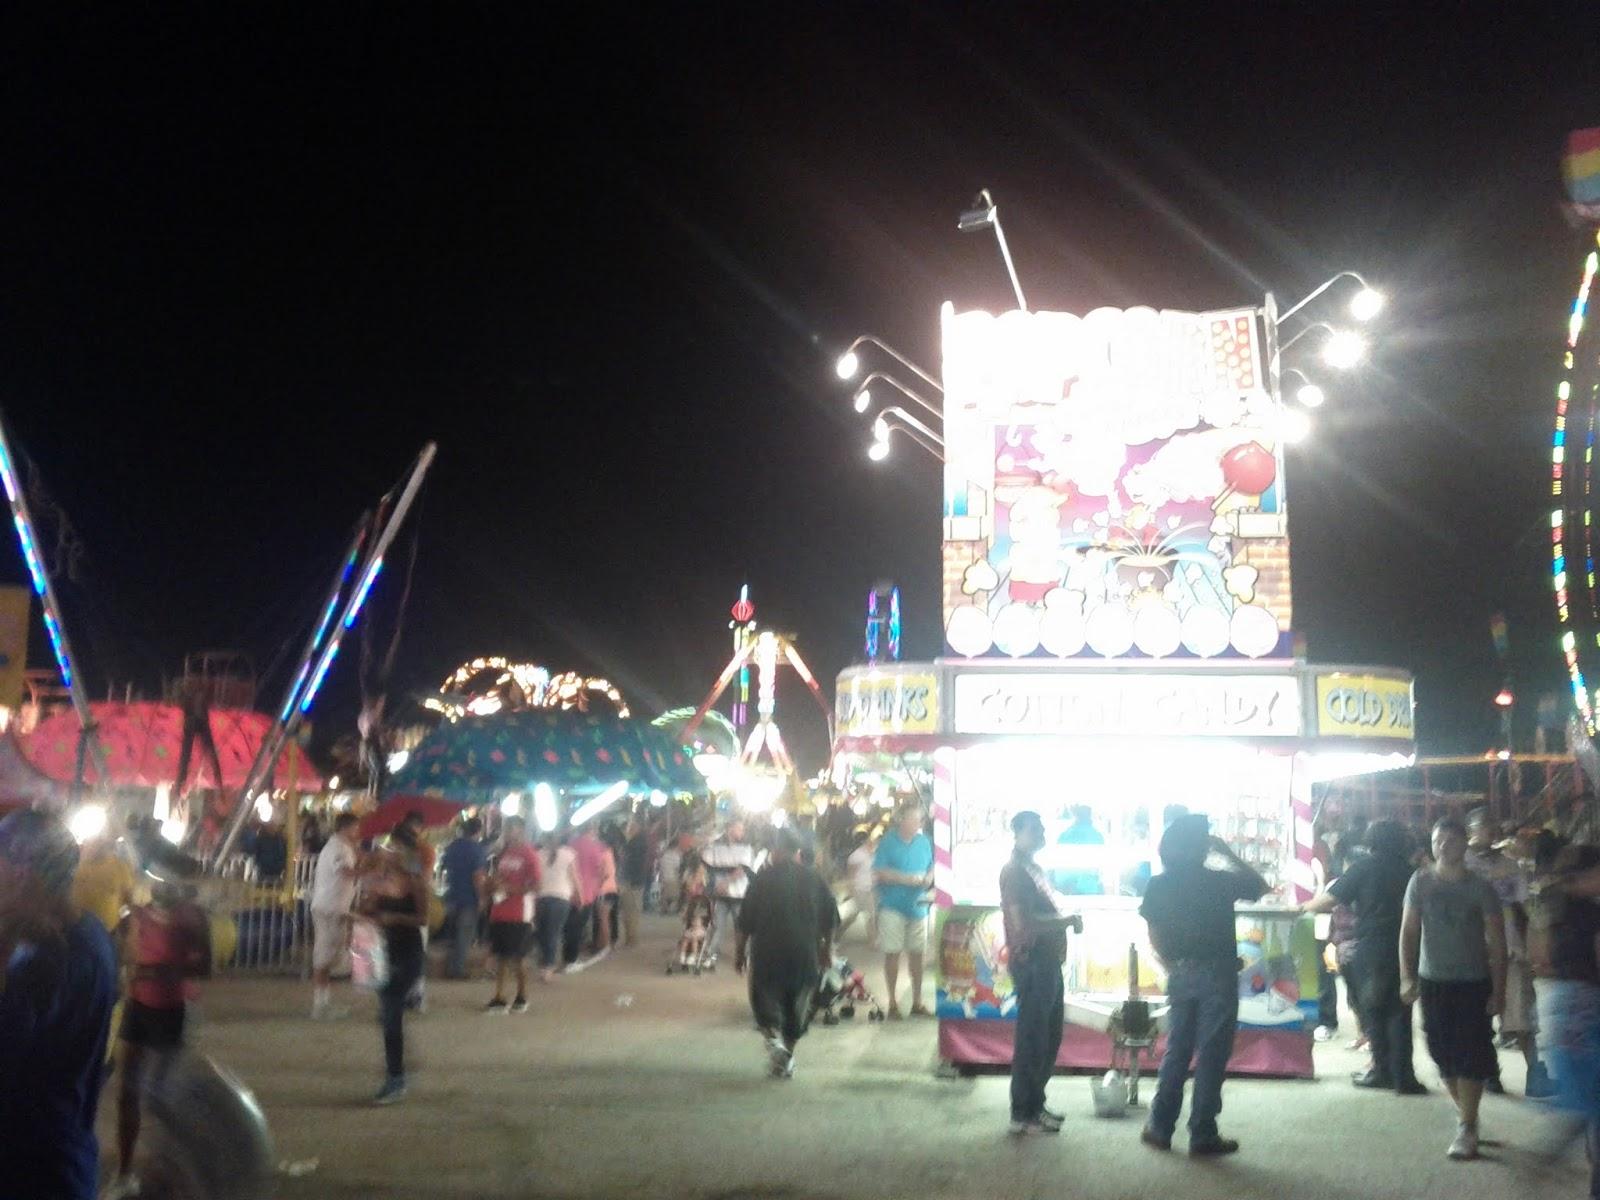 Fort Bend County Fair 2012 - IMG_20121006_202242.jpg